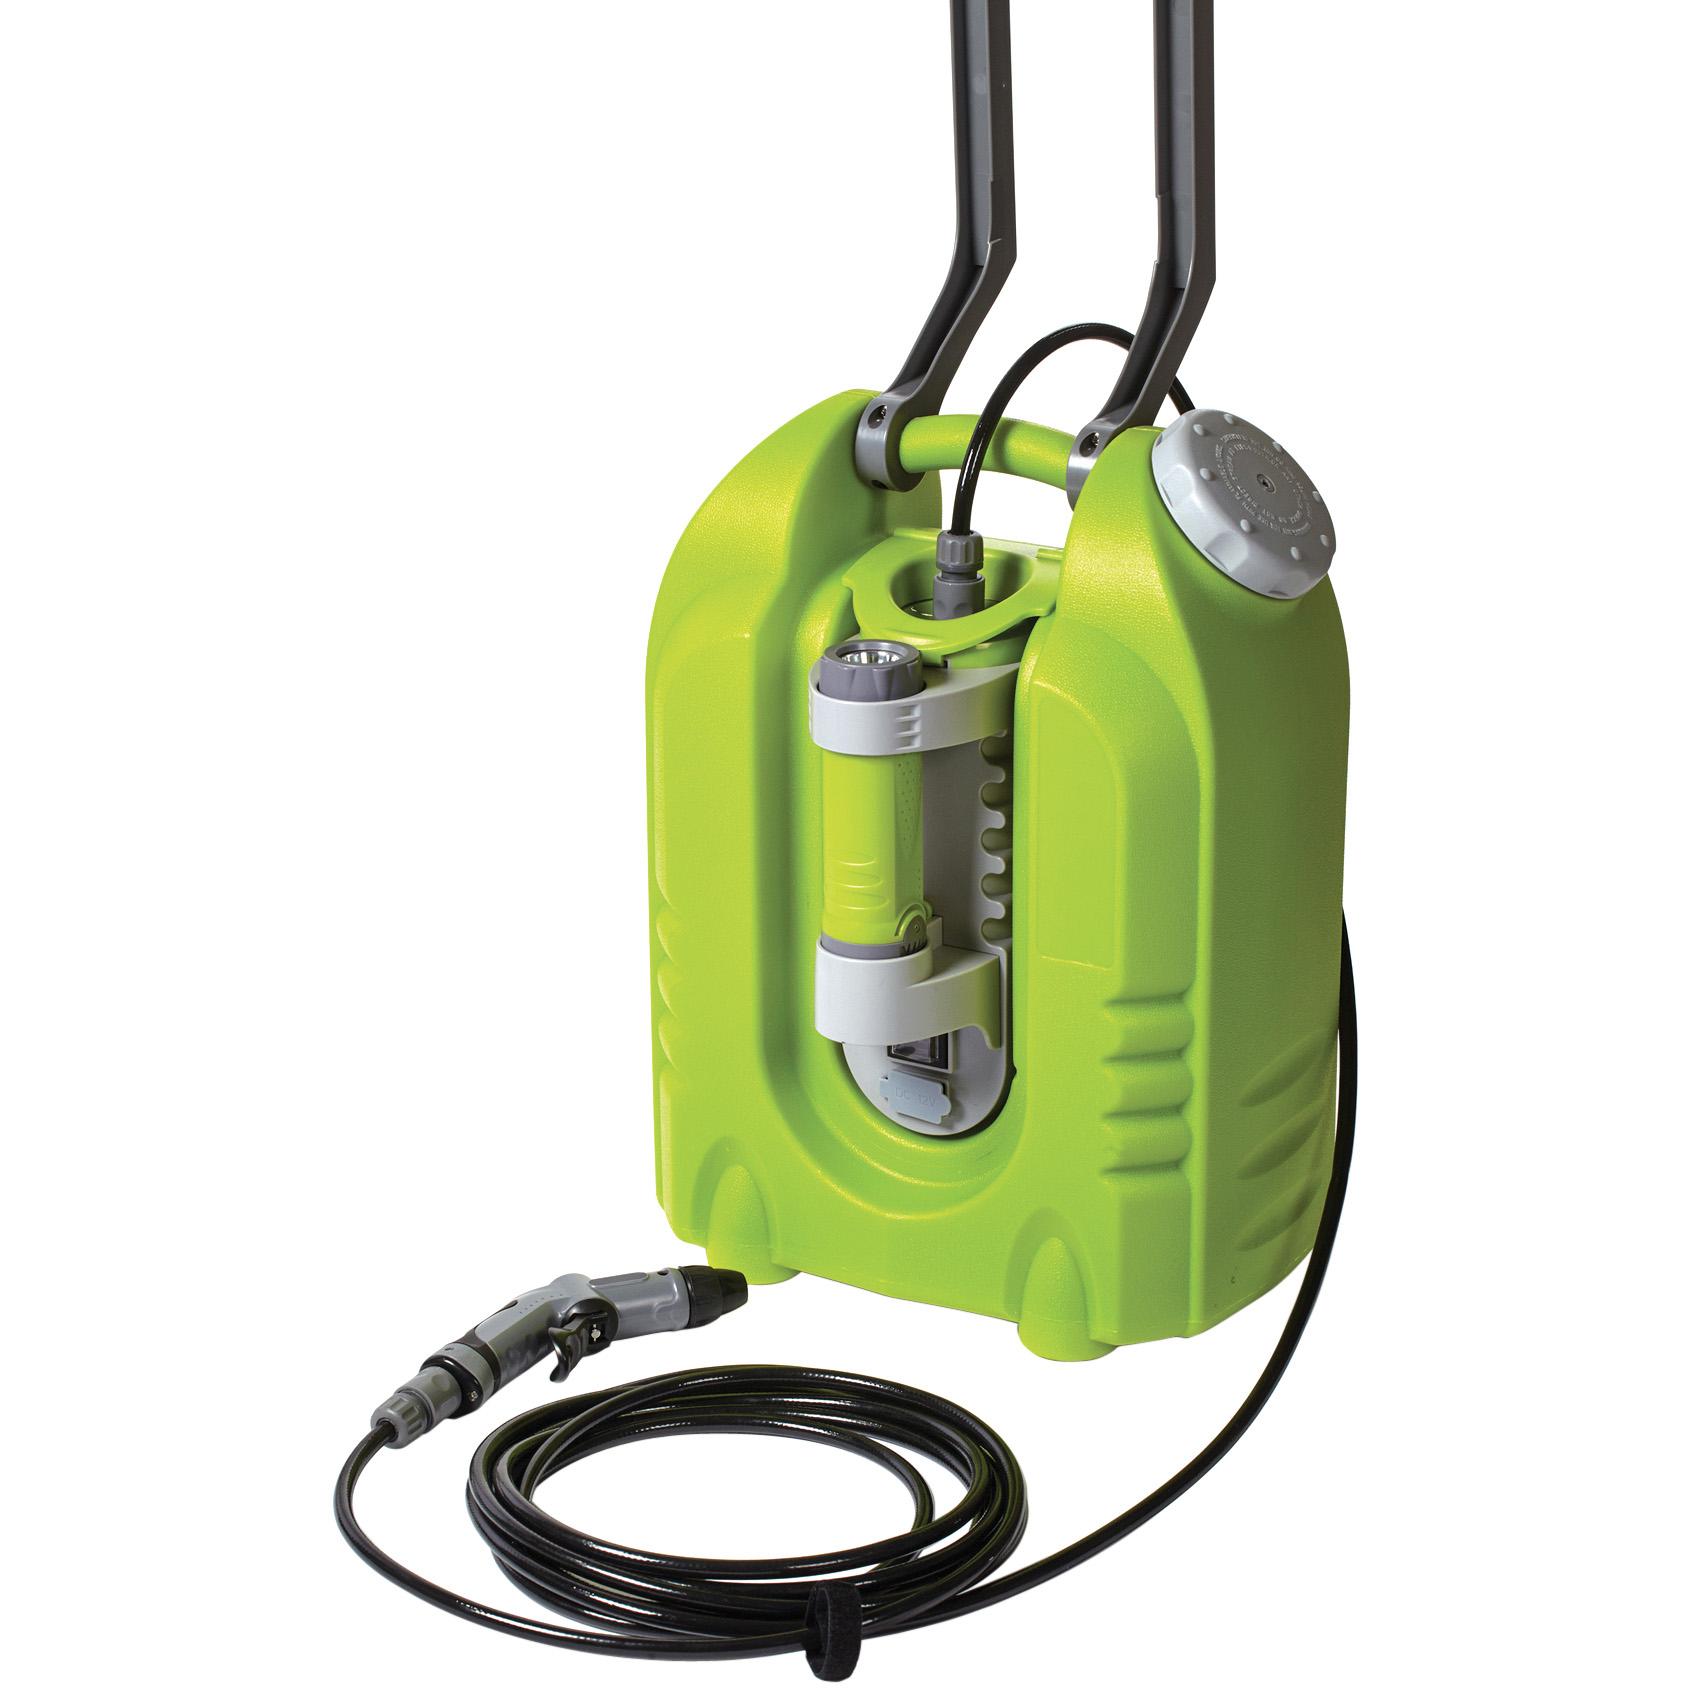 nettoyeur haute pression aqua2go pro lithium portable probikeshop. Black Bedroom Furniture Sets. Home Design Ideas